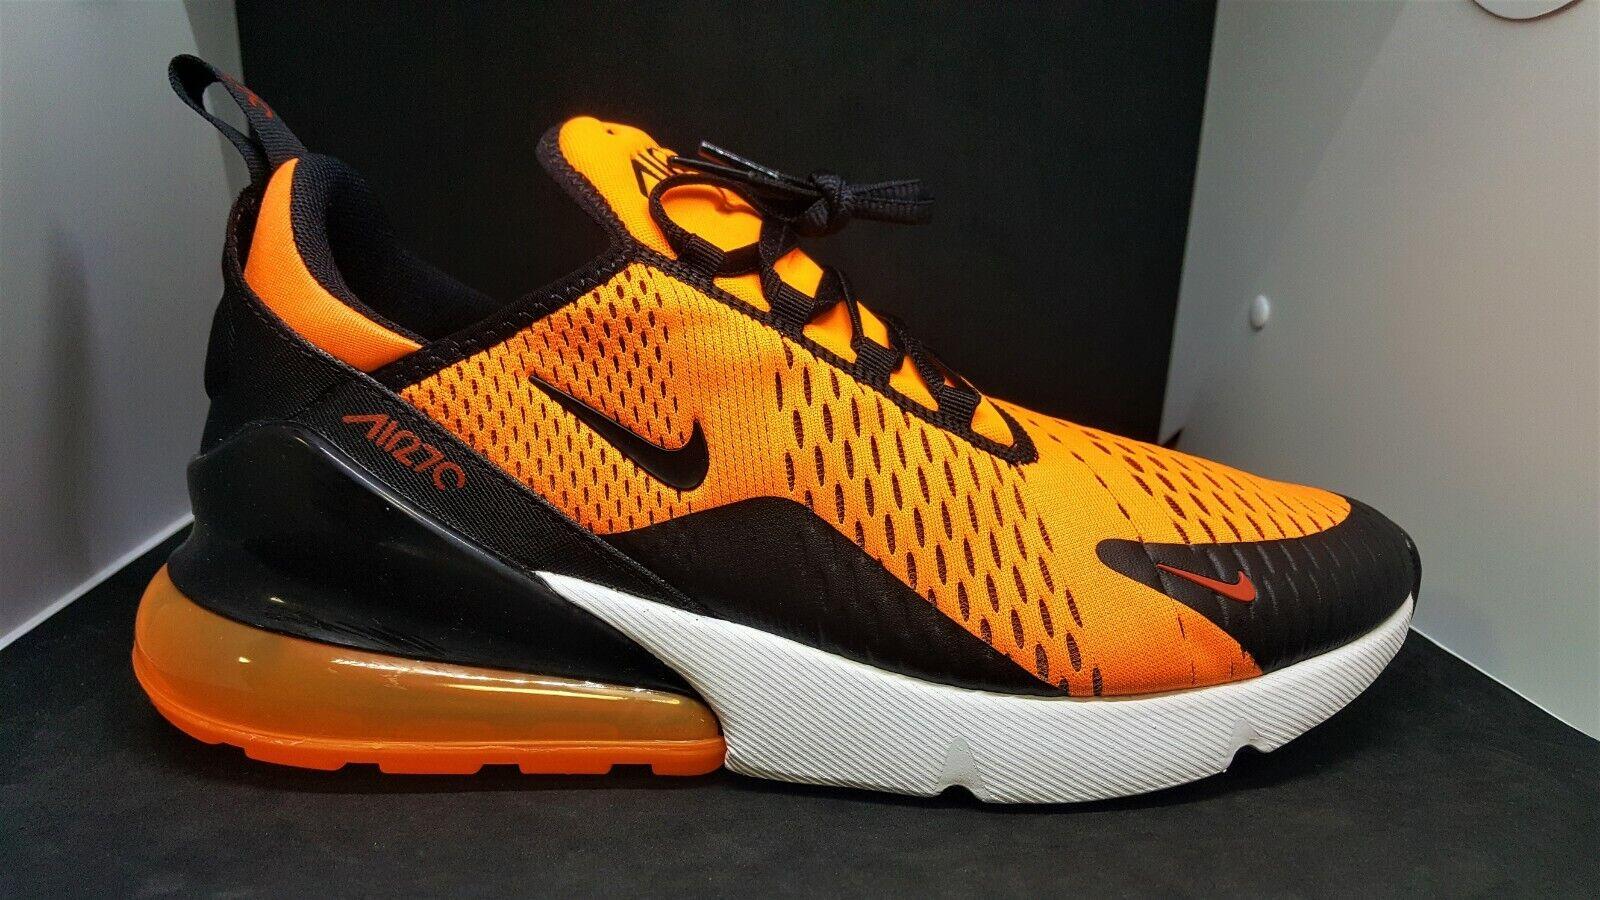 Nike Mens Air Max 270 Total orange   Black-White  BV2517 800